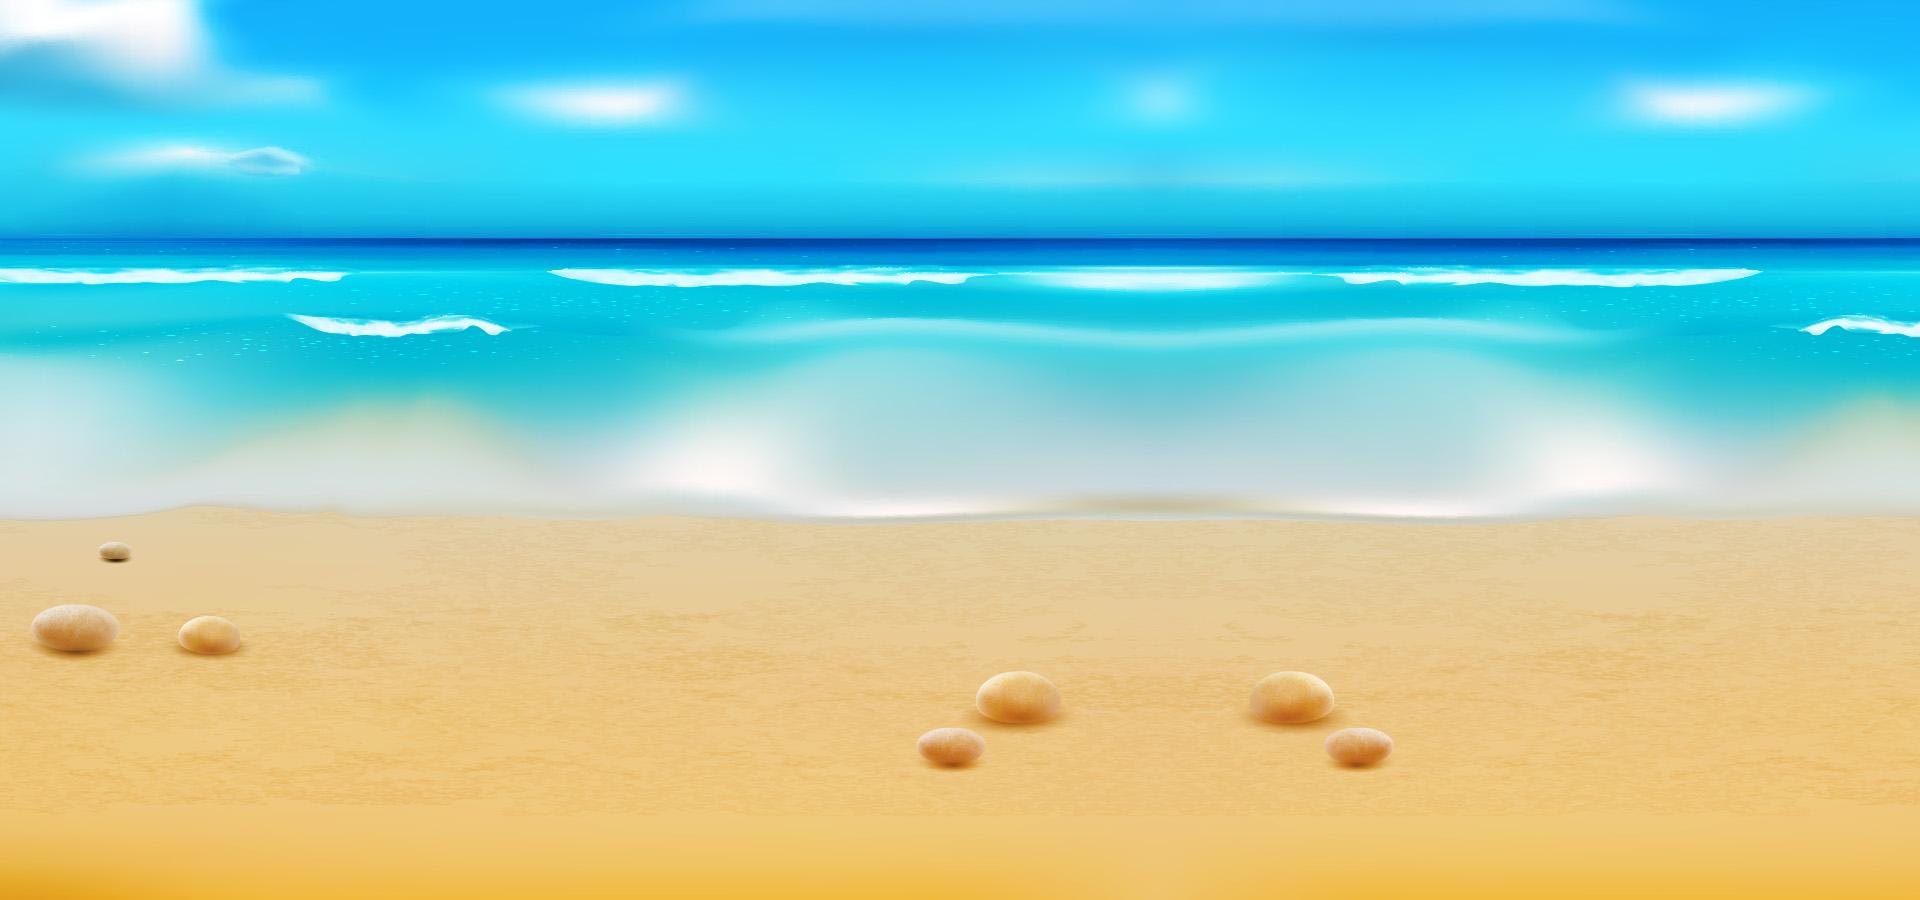 mr whippy melbourne matrix beach scene